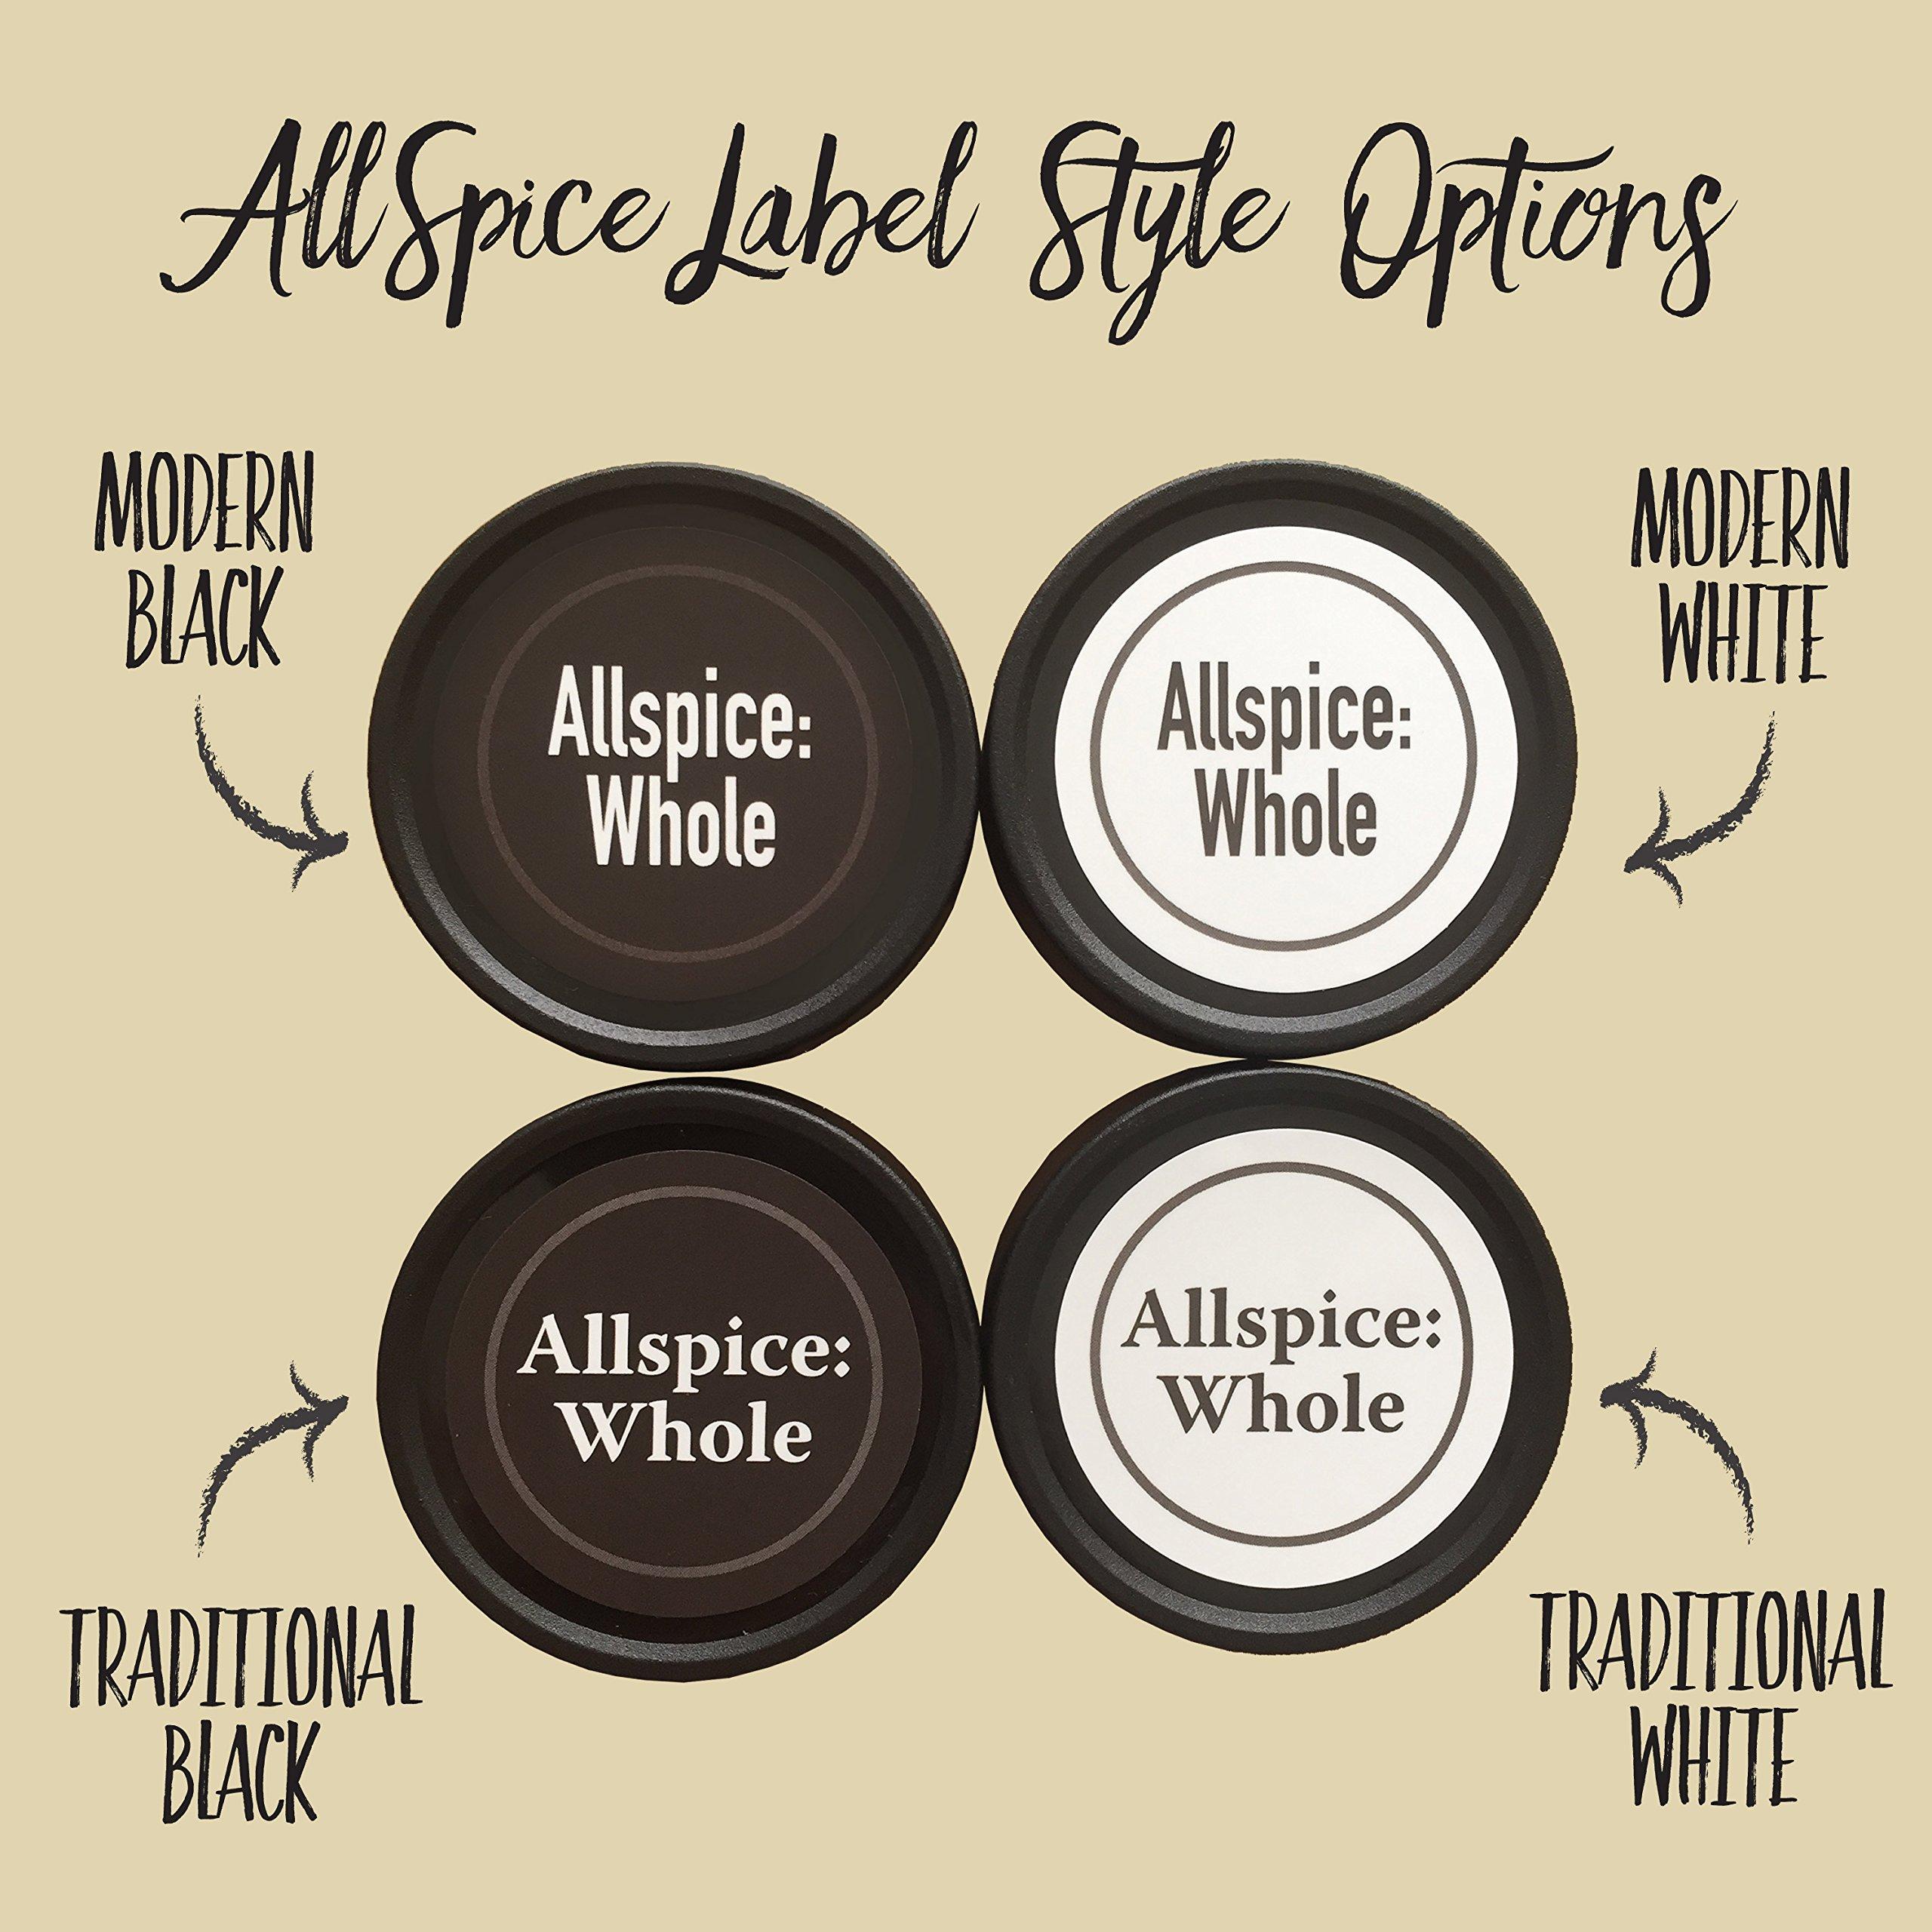 AllSpice 315 Preprinted Water Resistant Round Spice Jar